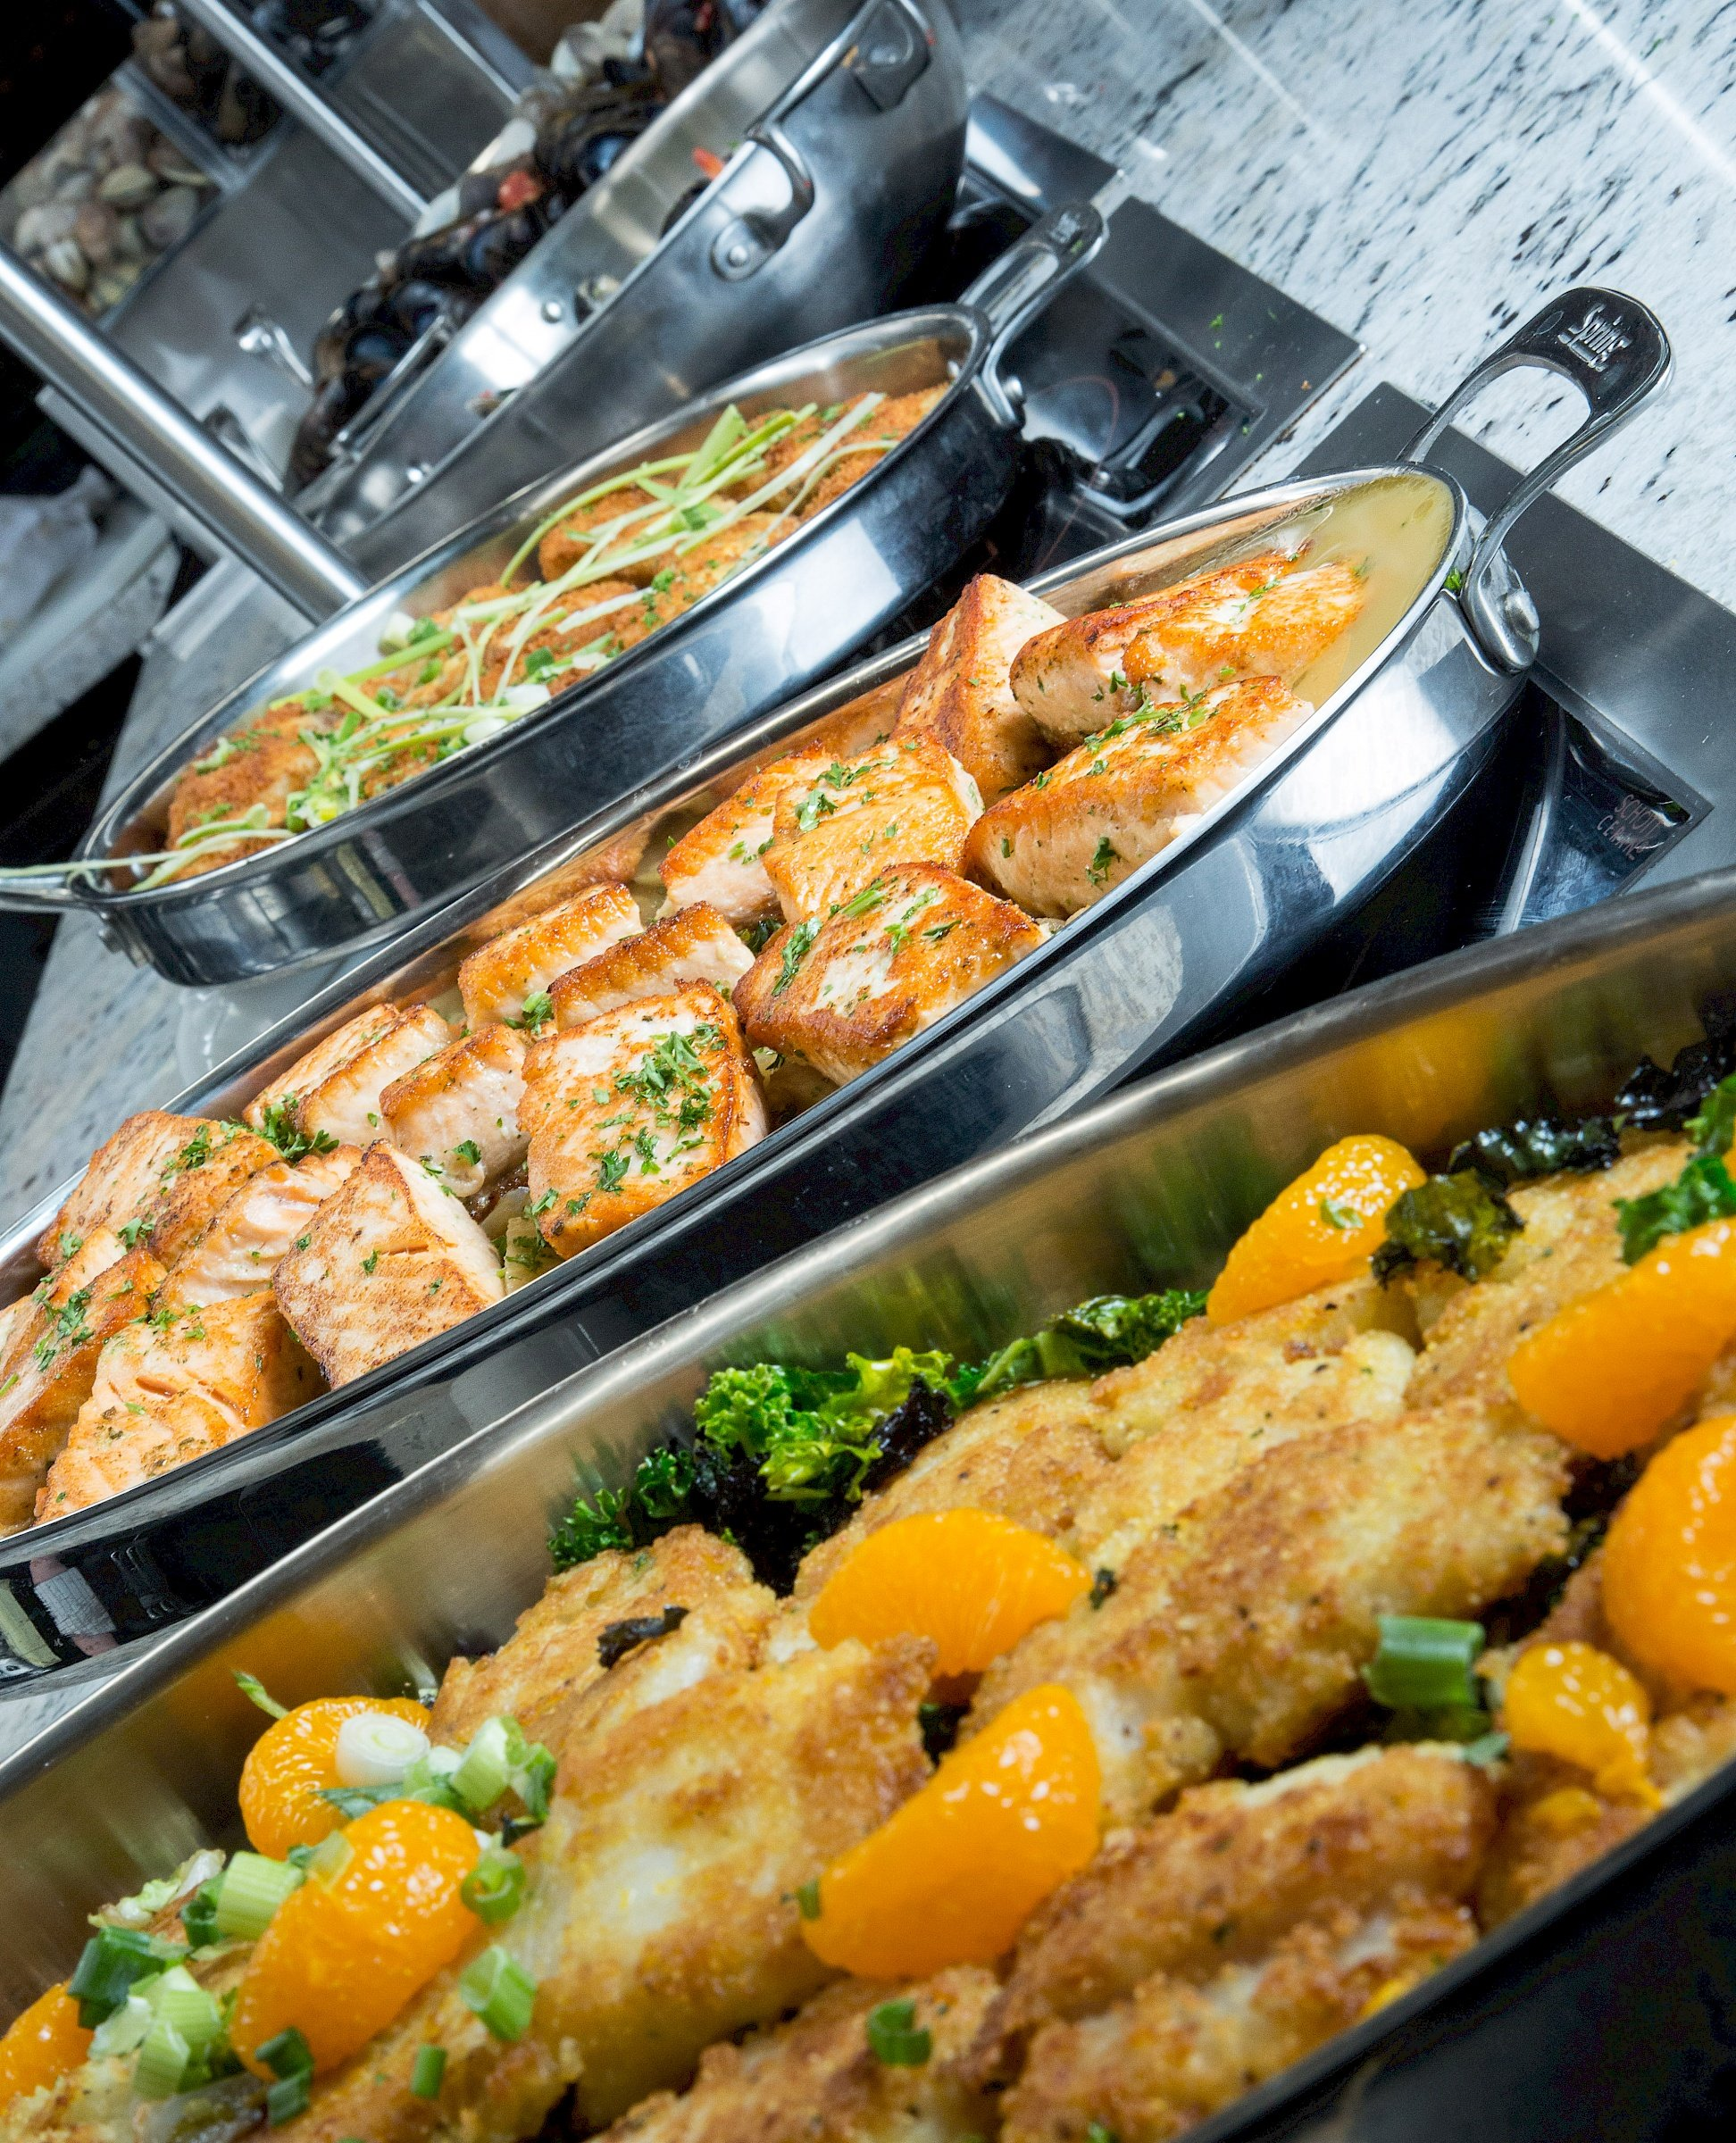 Grand falls casino seafood buffet